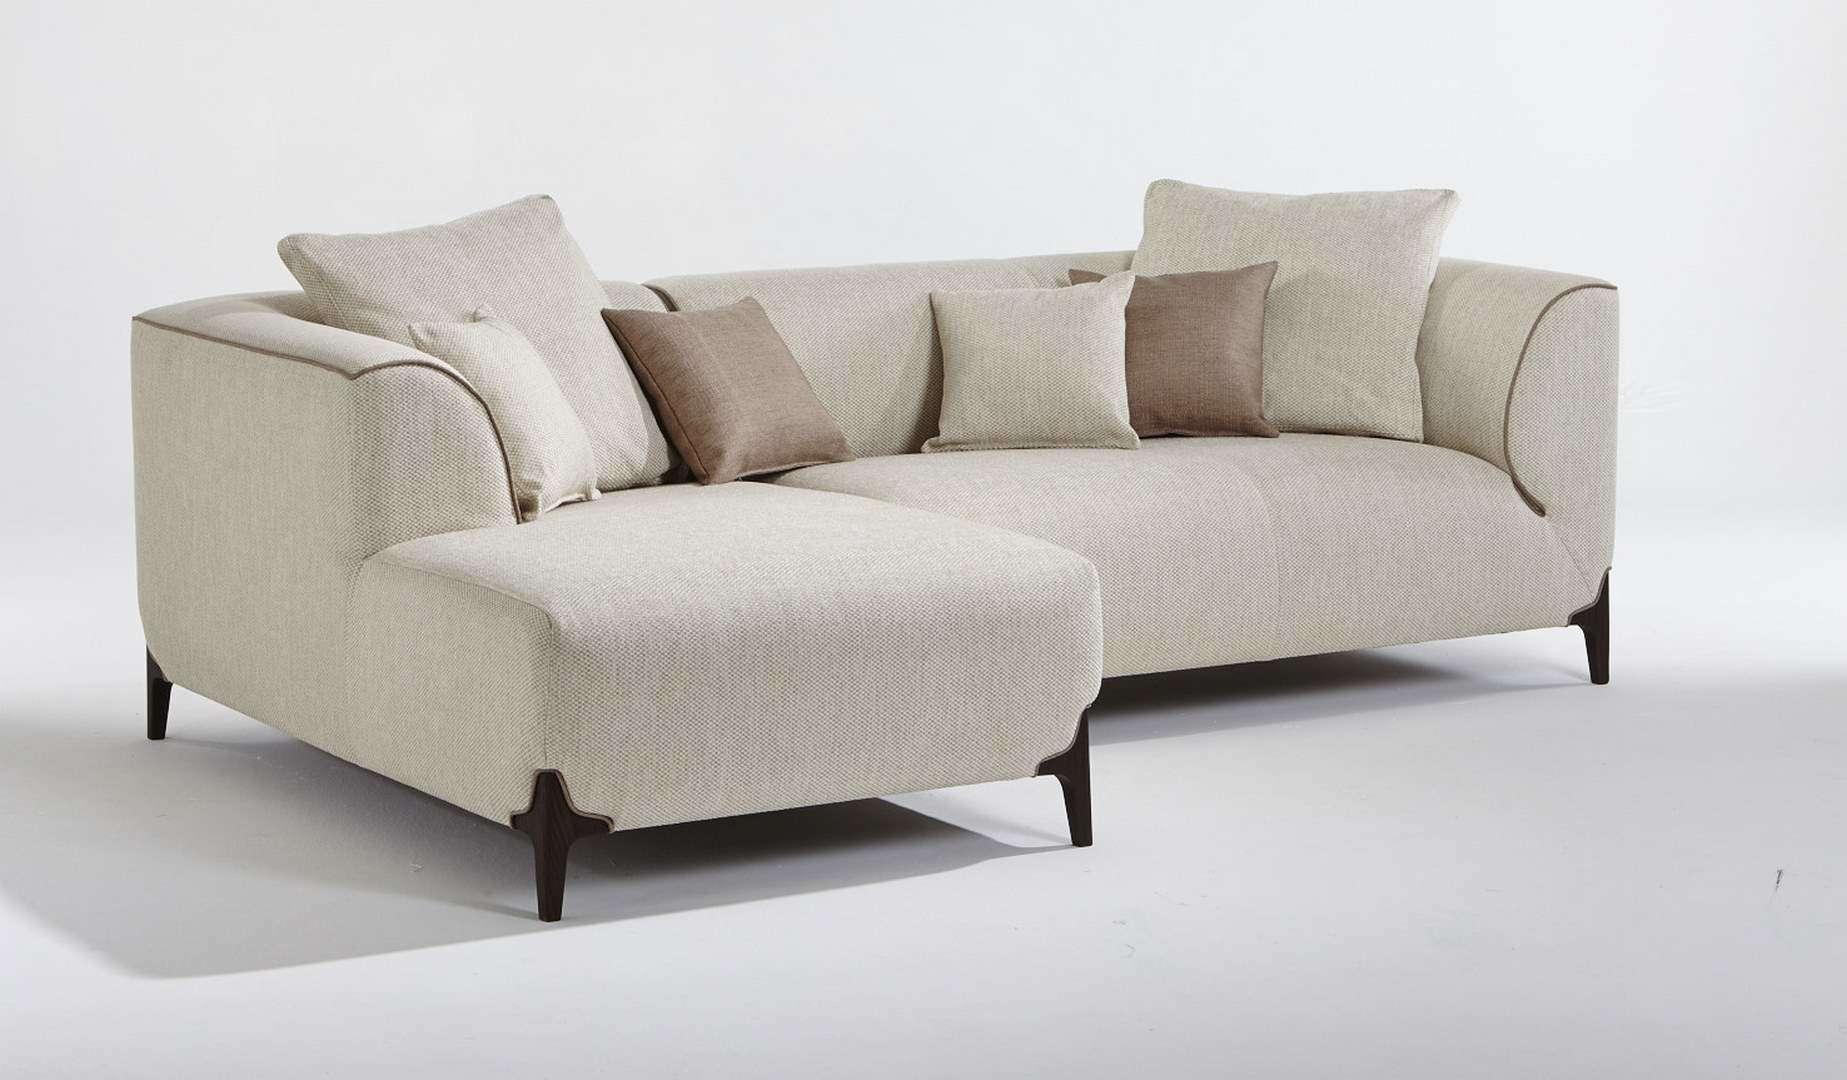 Canapé tissu haut de gamme